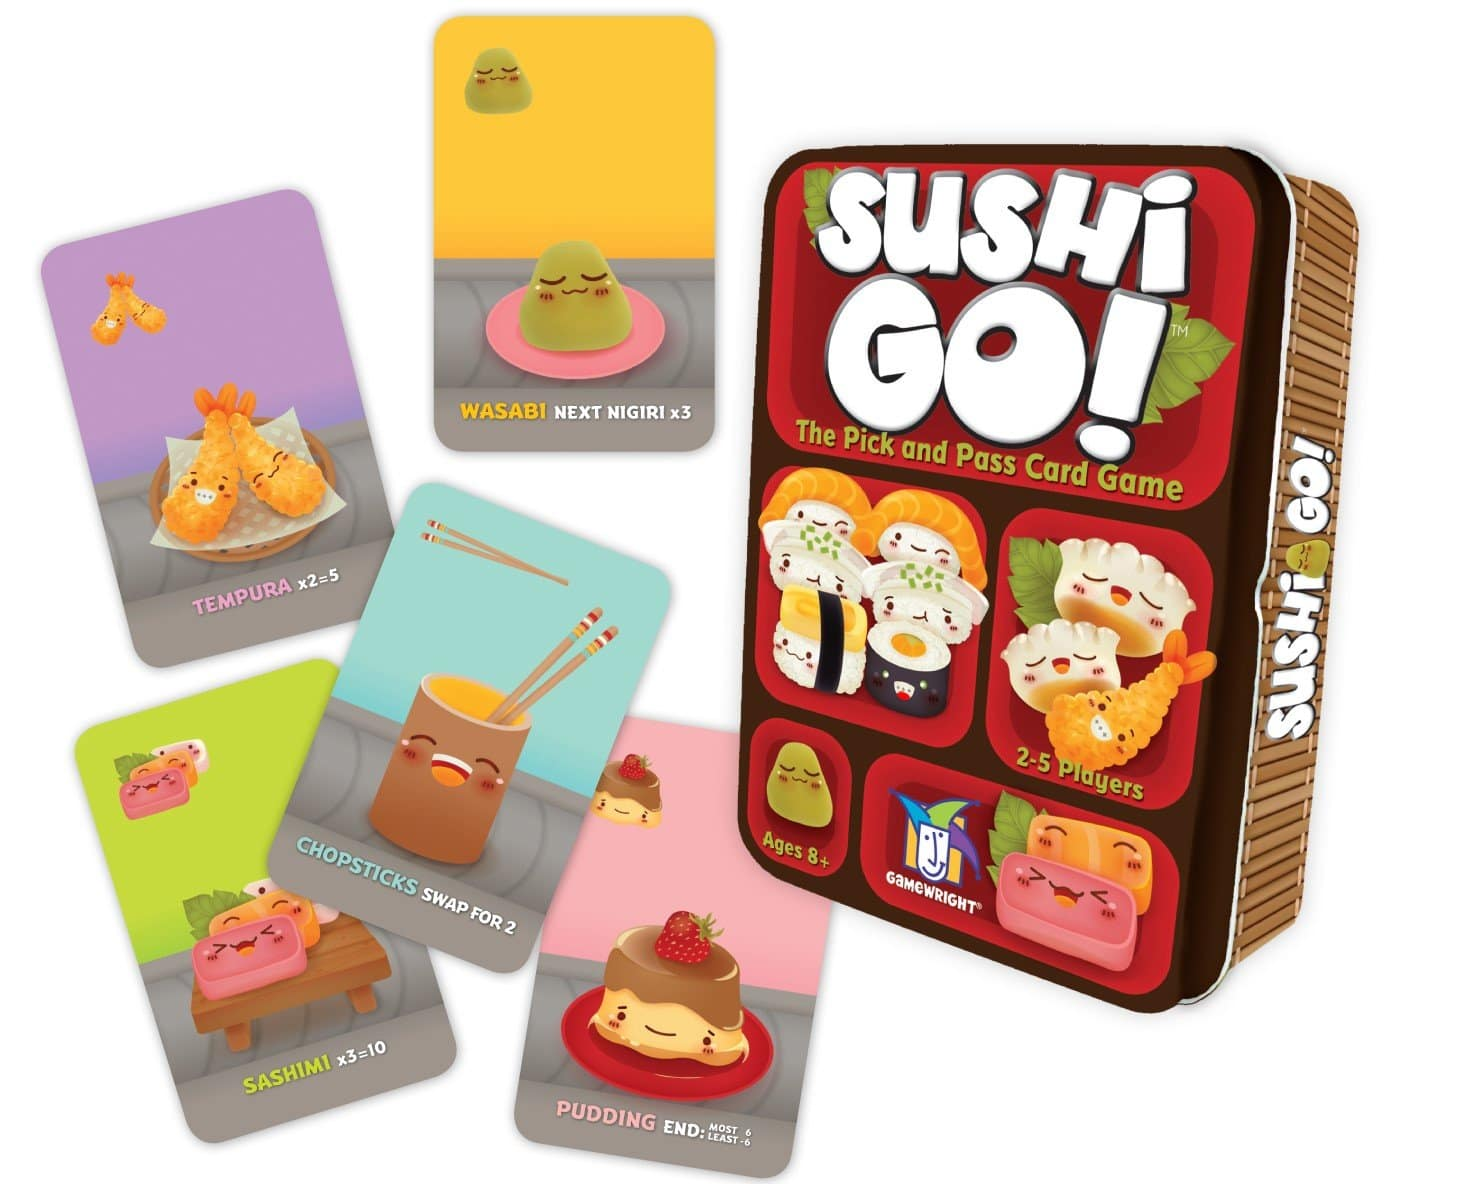 Sushi go card game $6.74